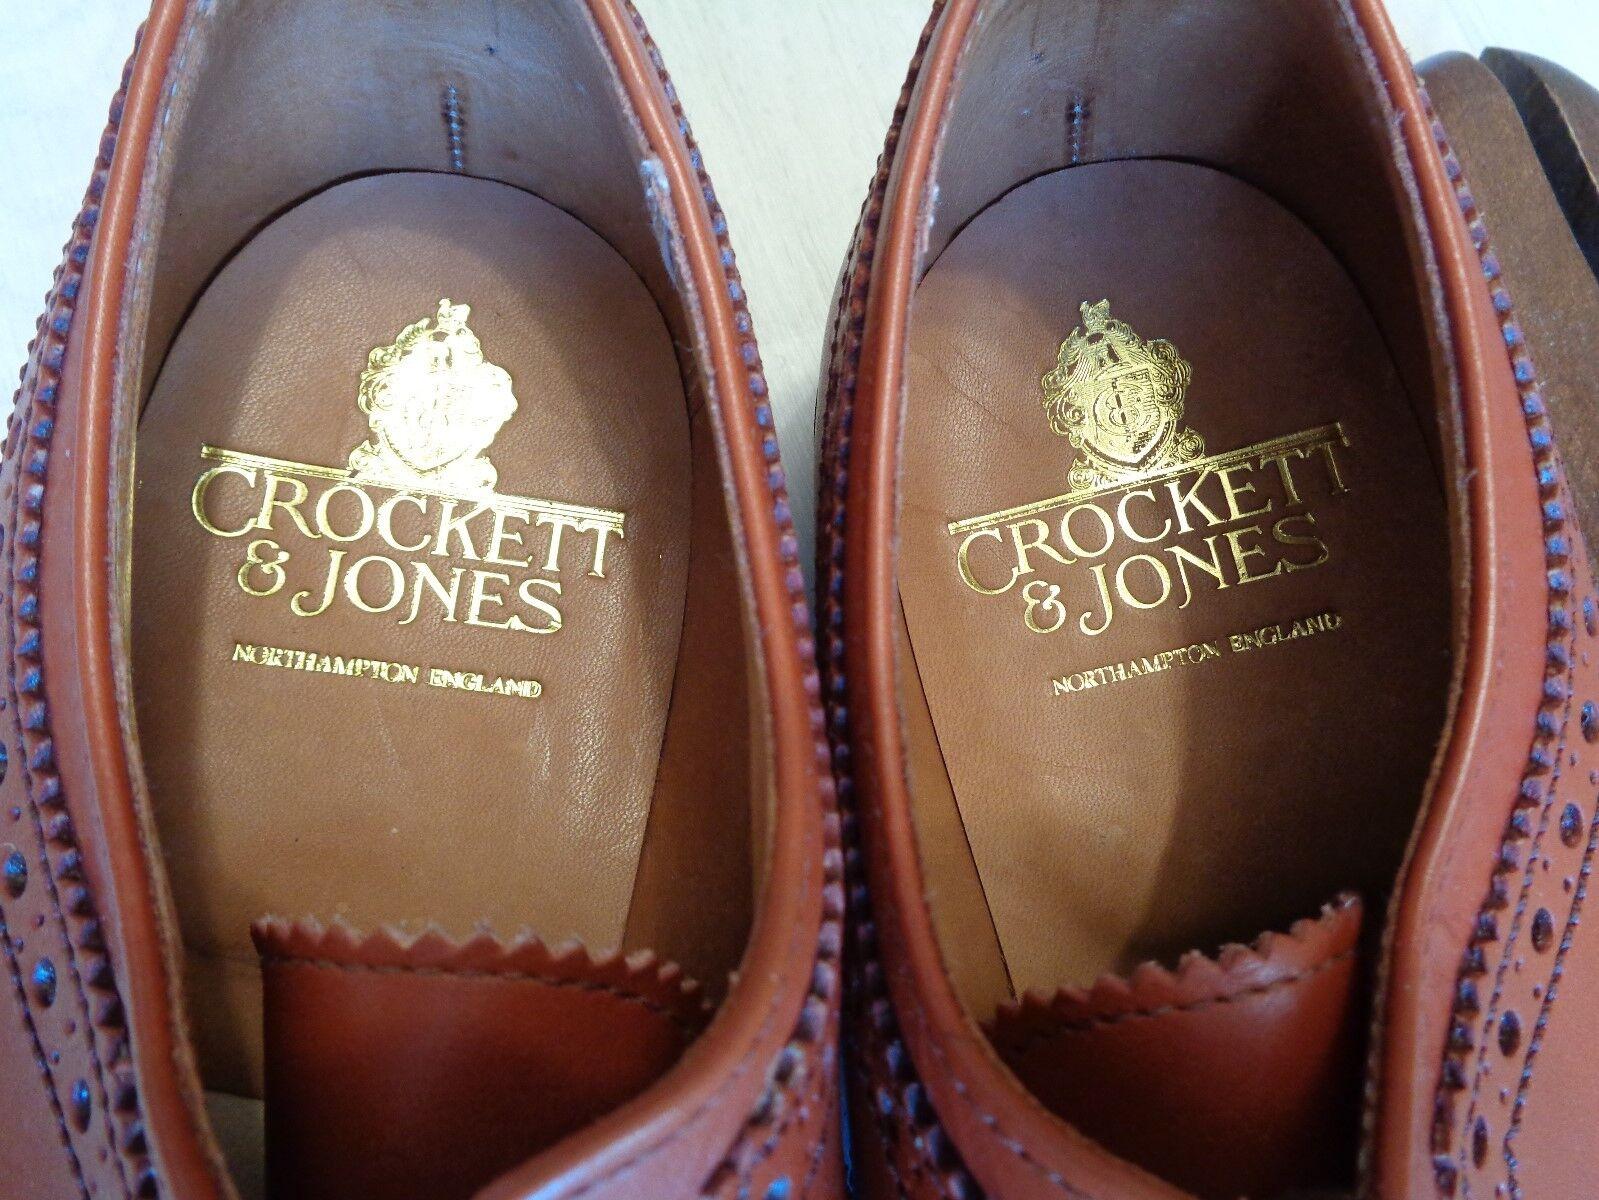 New Crockett & Jones vtg brogue brogue brogue UK 7.5 41.5 full leather wingtip derby BNWOB 22f71e